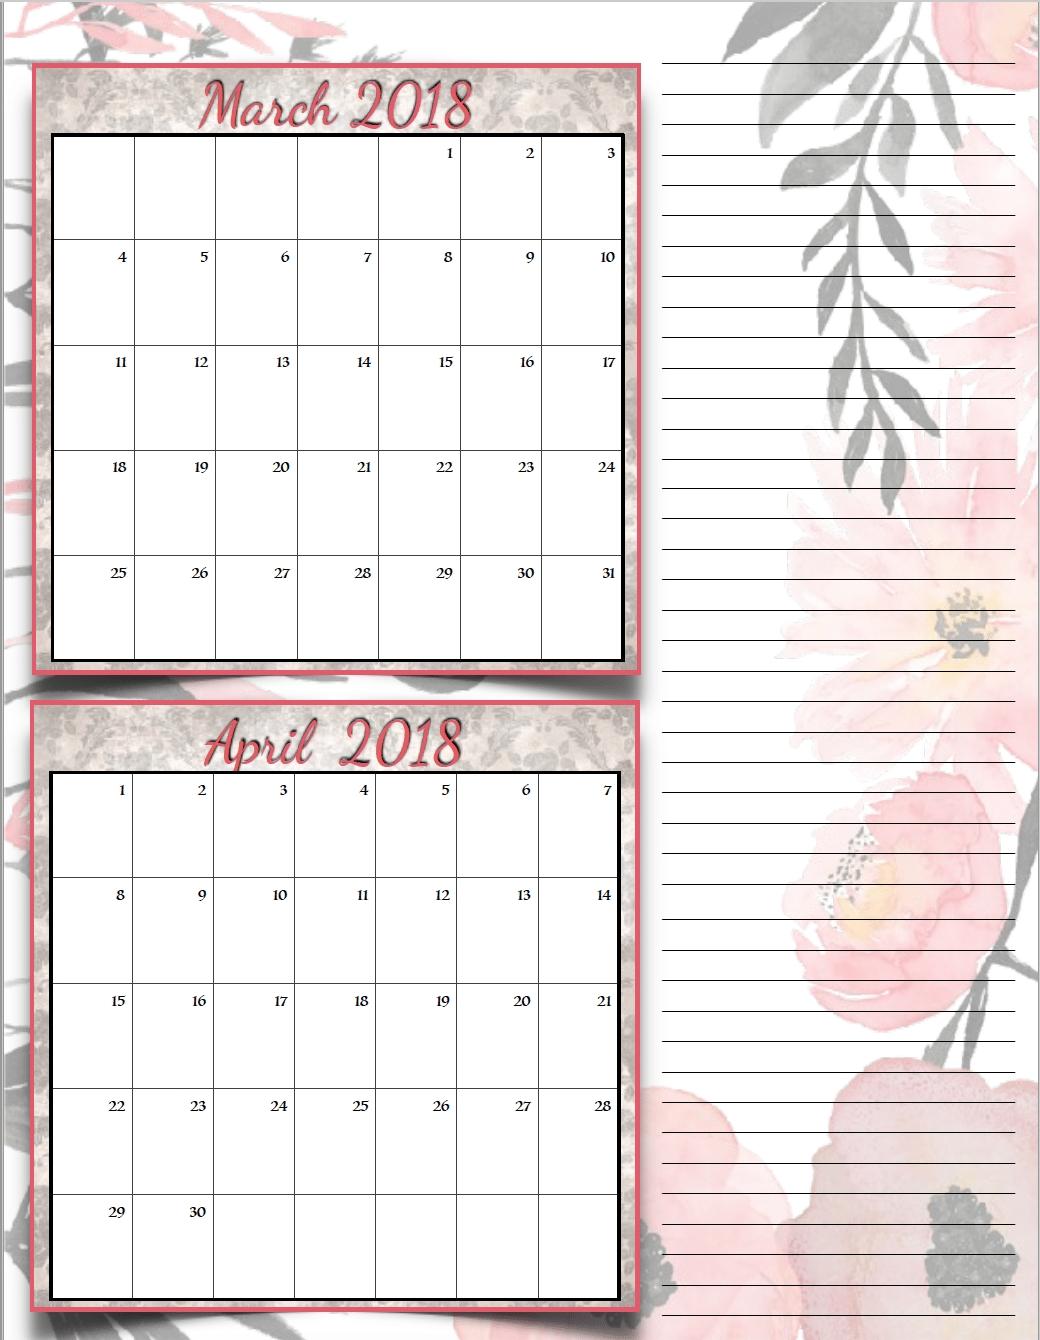 Free Printable 2018 Bimonthly Calendars: 6 Designs